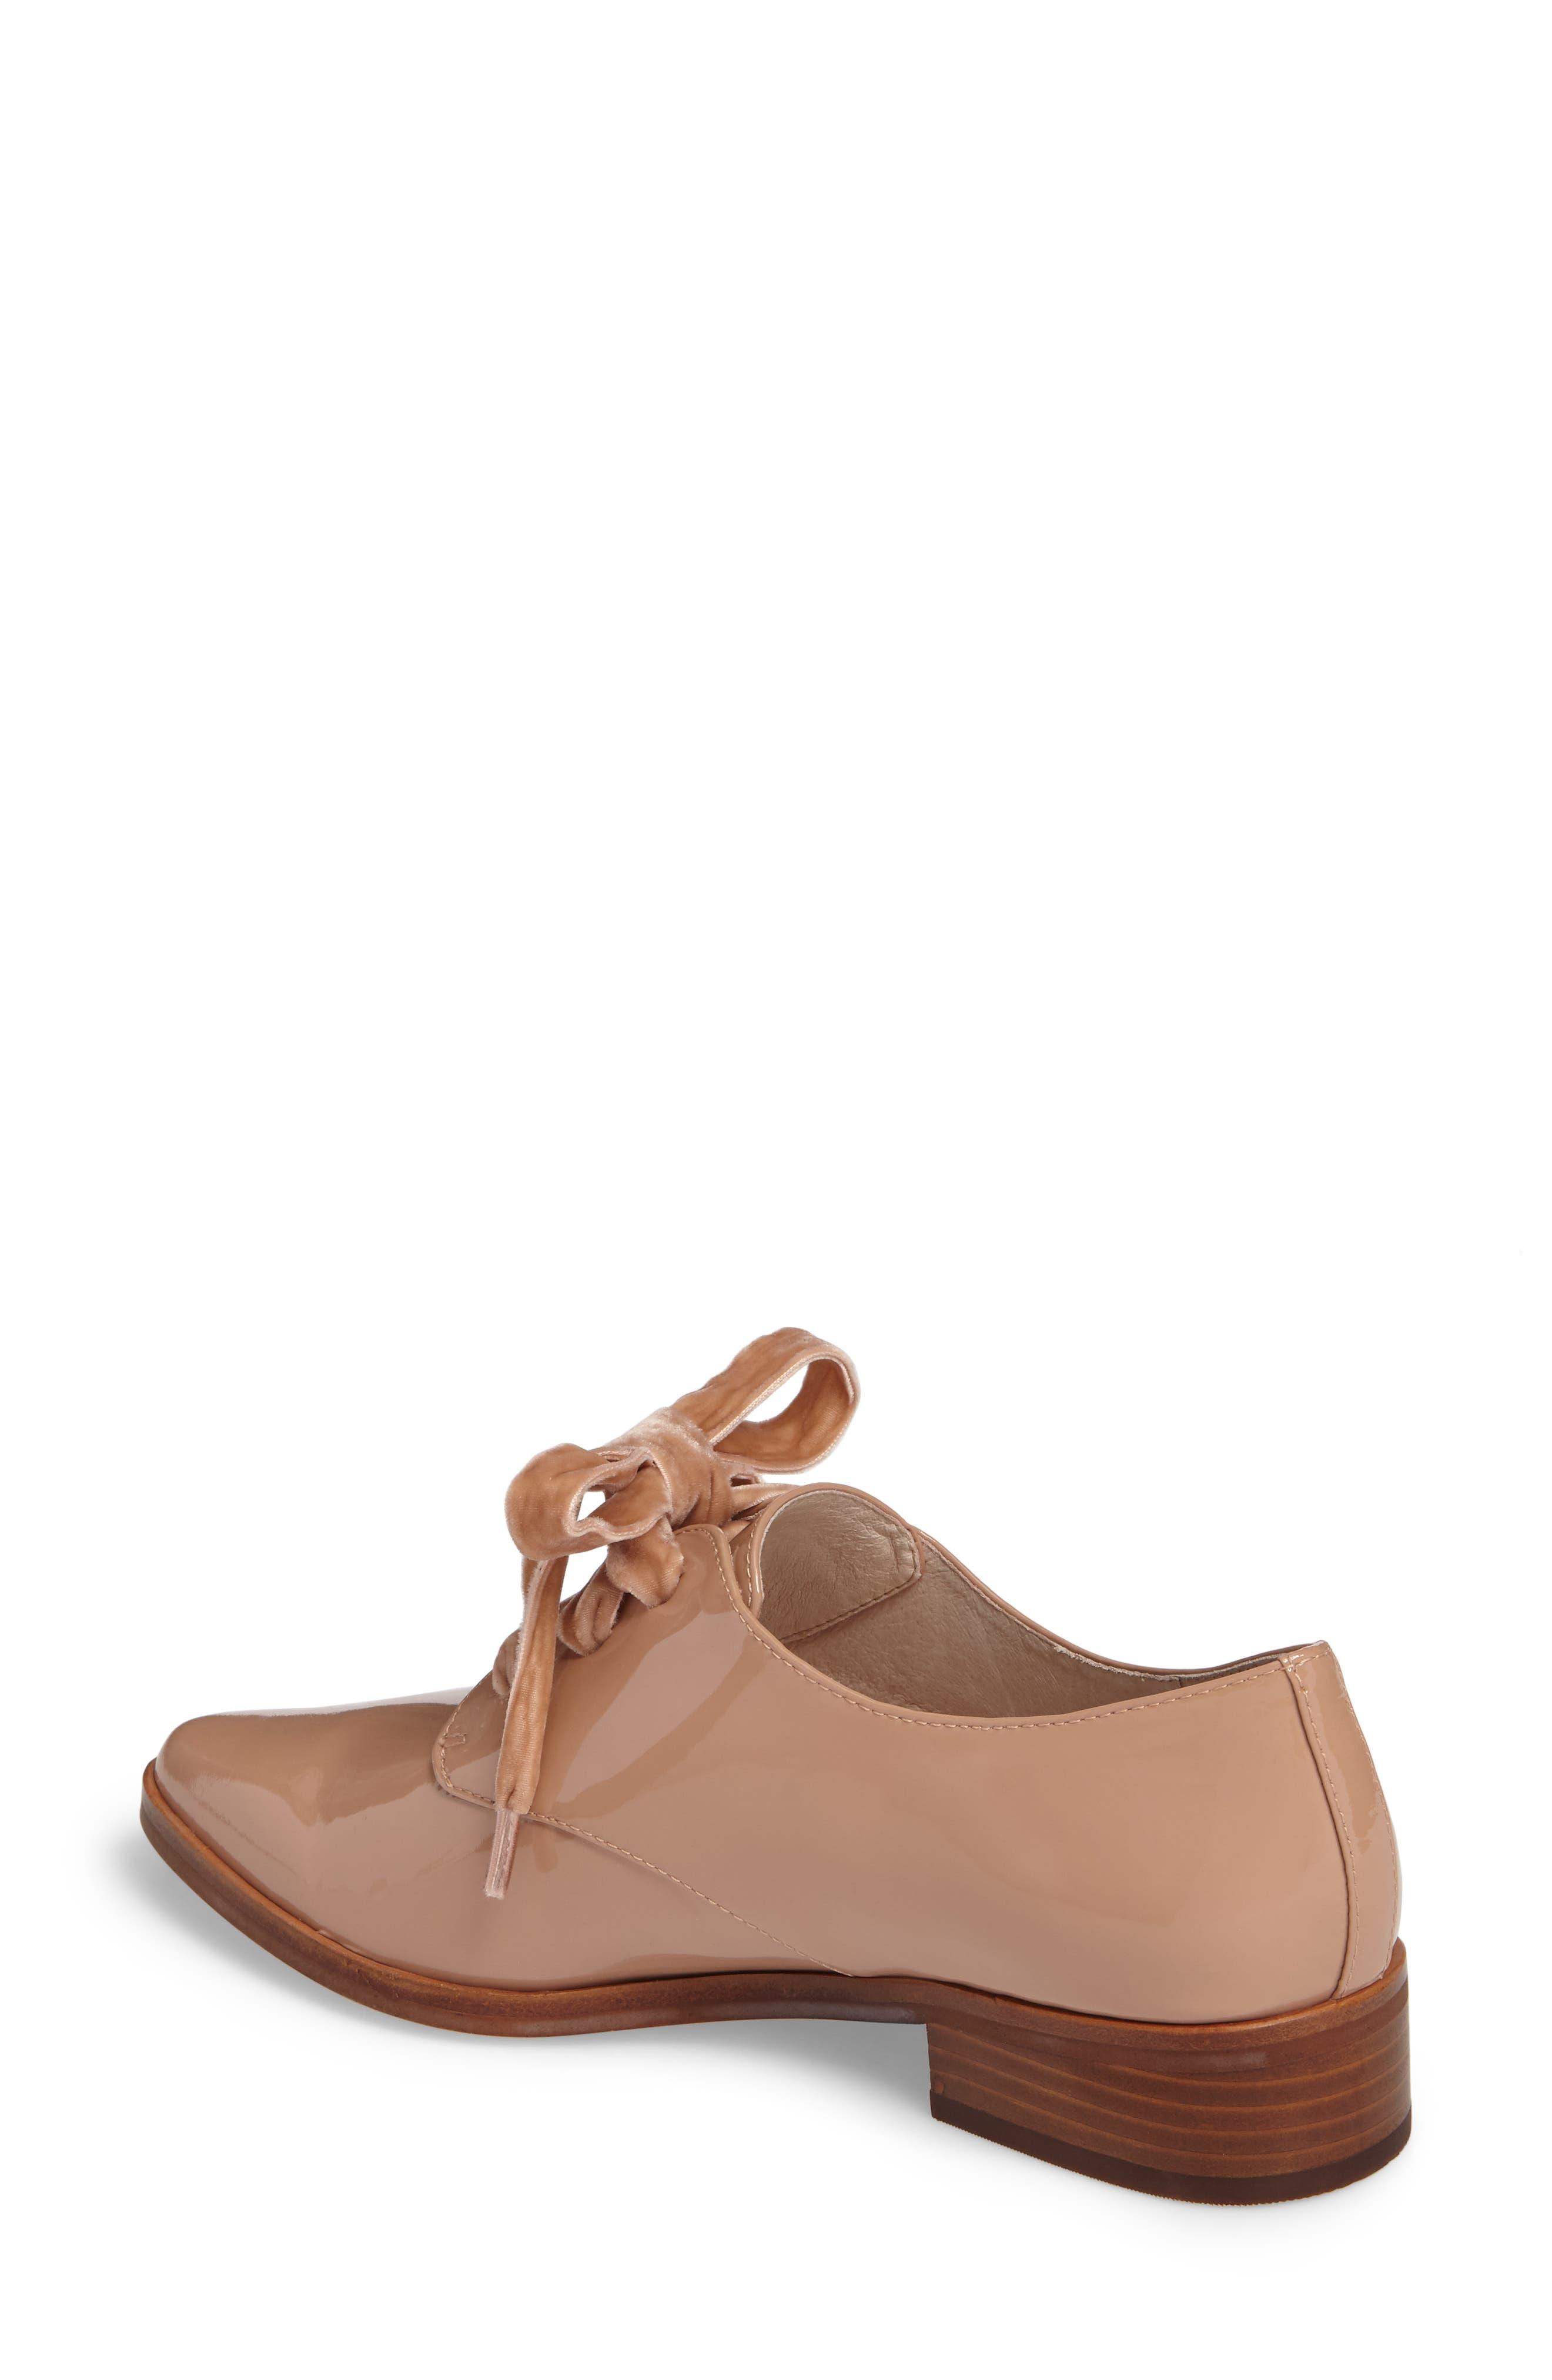 Alternate Image 2  - Louise et Cie 'Adwin' Almond Toe Oxford (Women) (Nordstrom Exclusive)